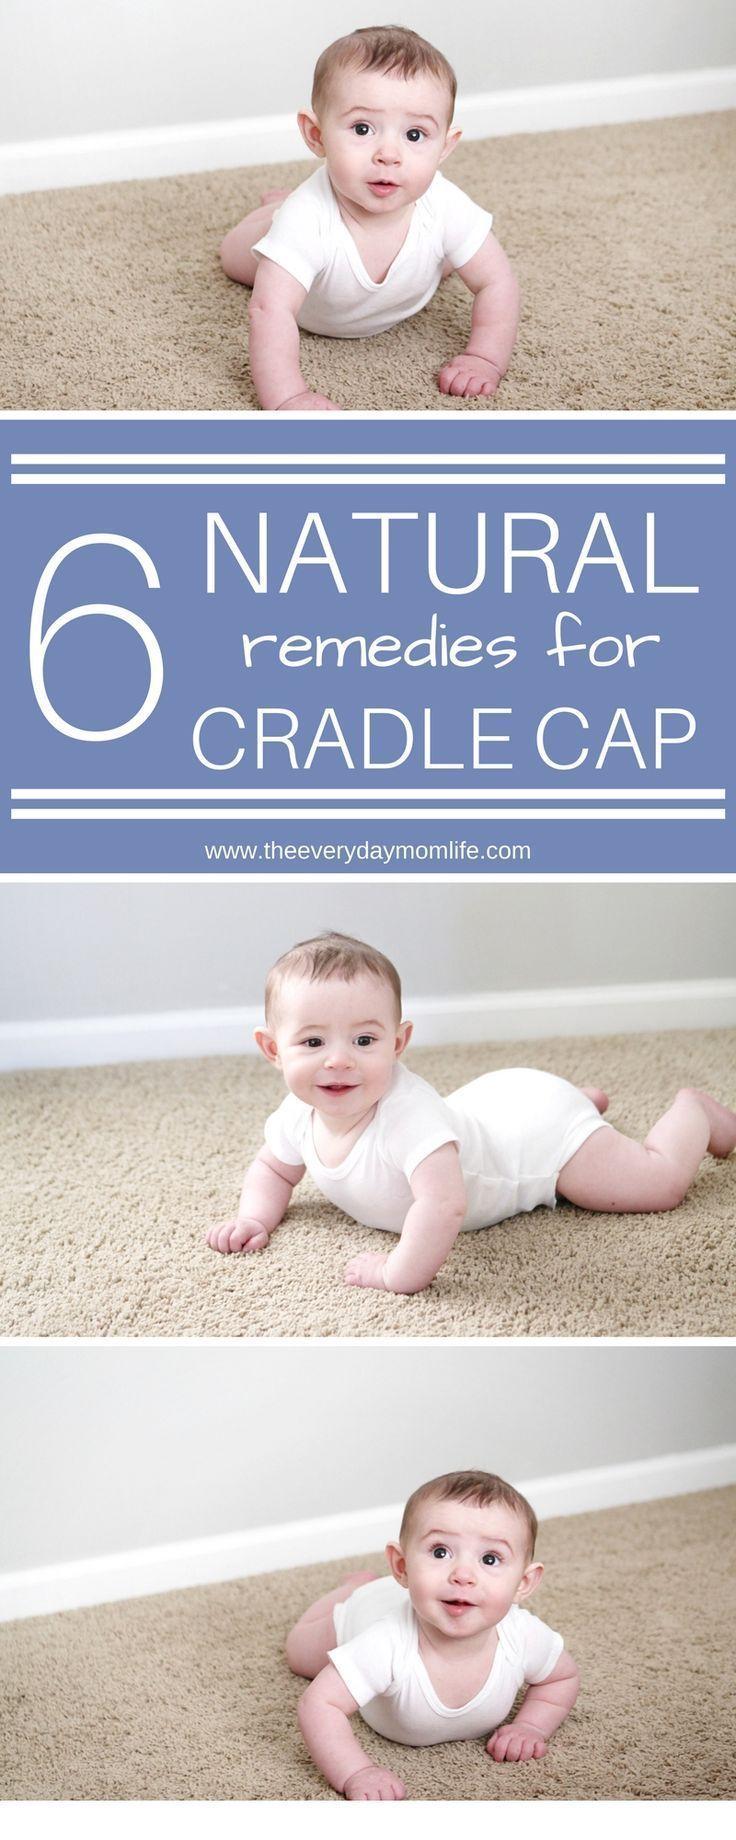 acd2377661b 6 Natural Remedies For Cradle Cap